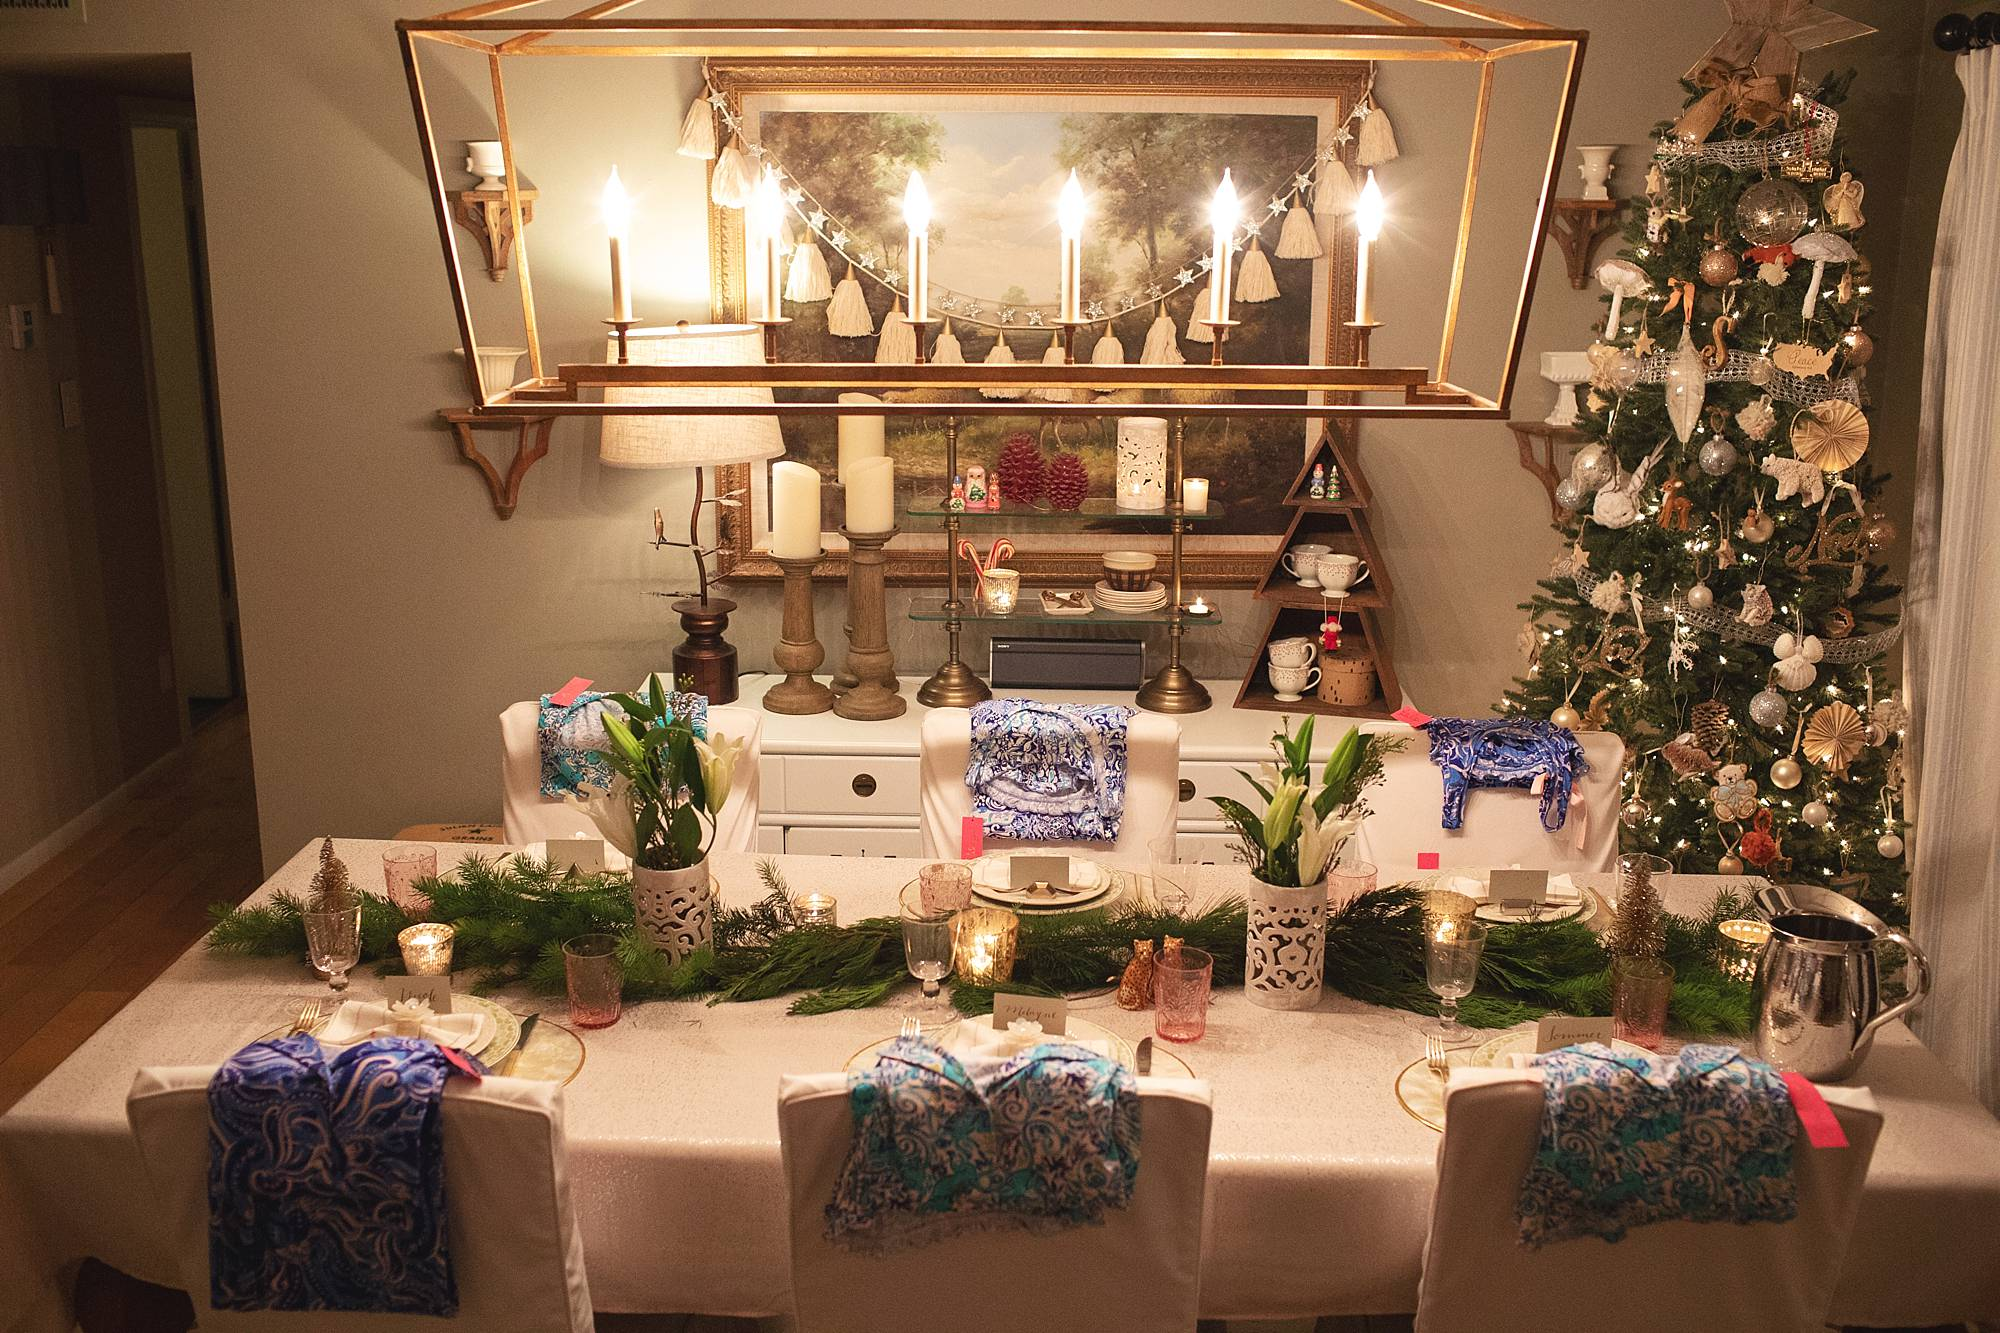 Christmas dinner party sleepover slumber party Lilly pulitzer pajamas